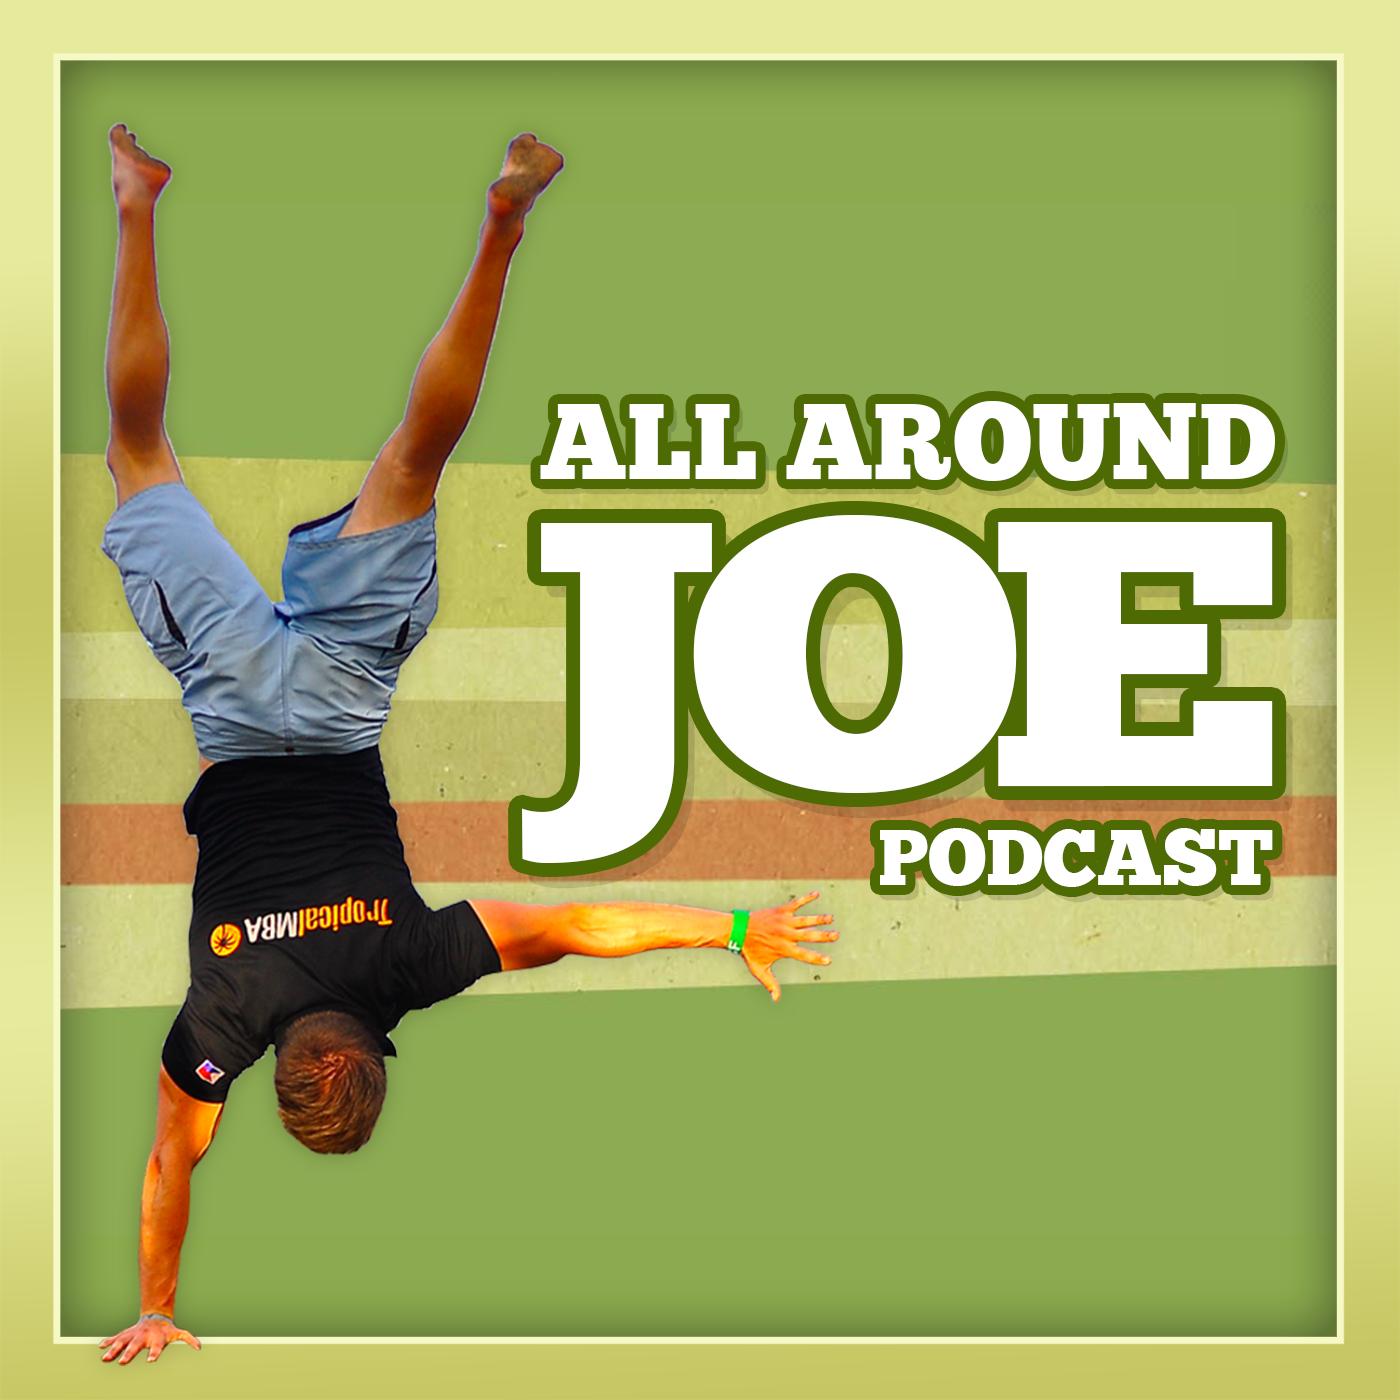 The AllAroundJoe Podcast: Fitness | CrossFit | Nutrition